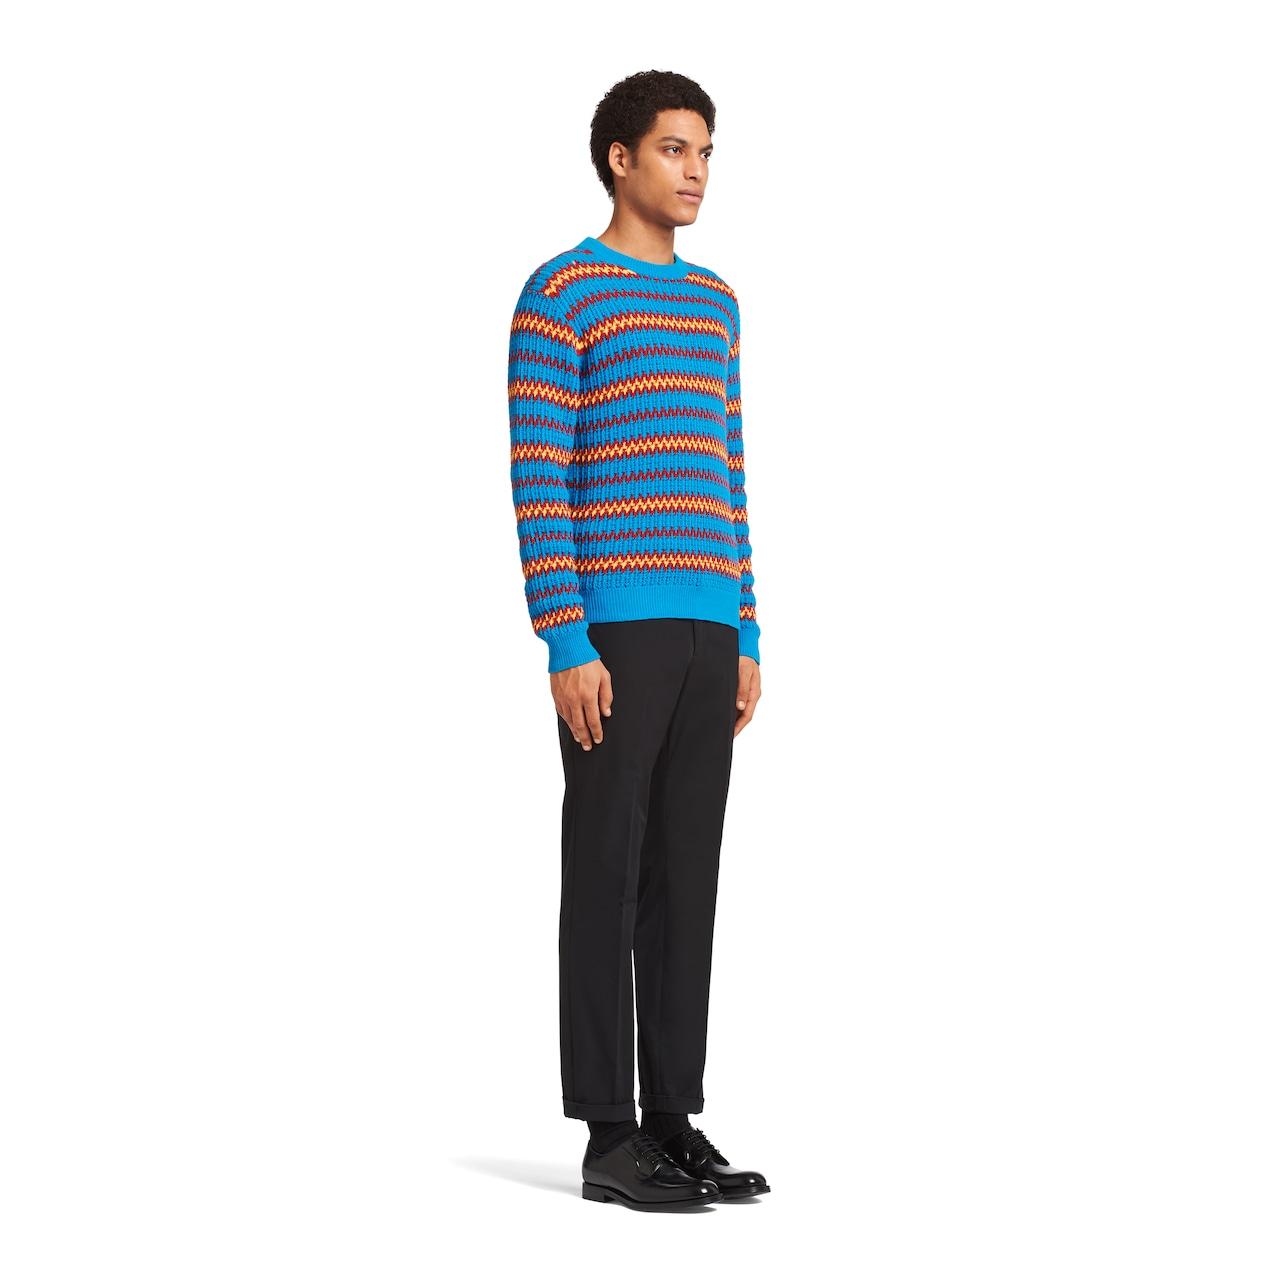 Prada Wool and cashmere sweater 3